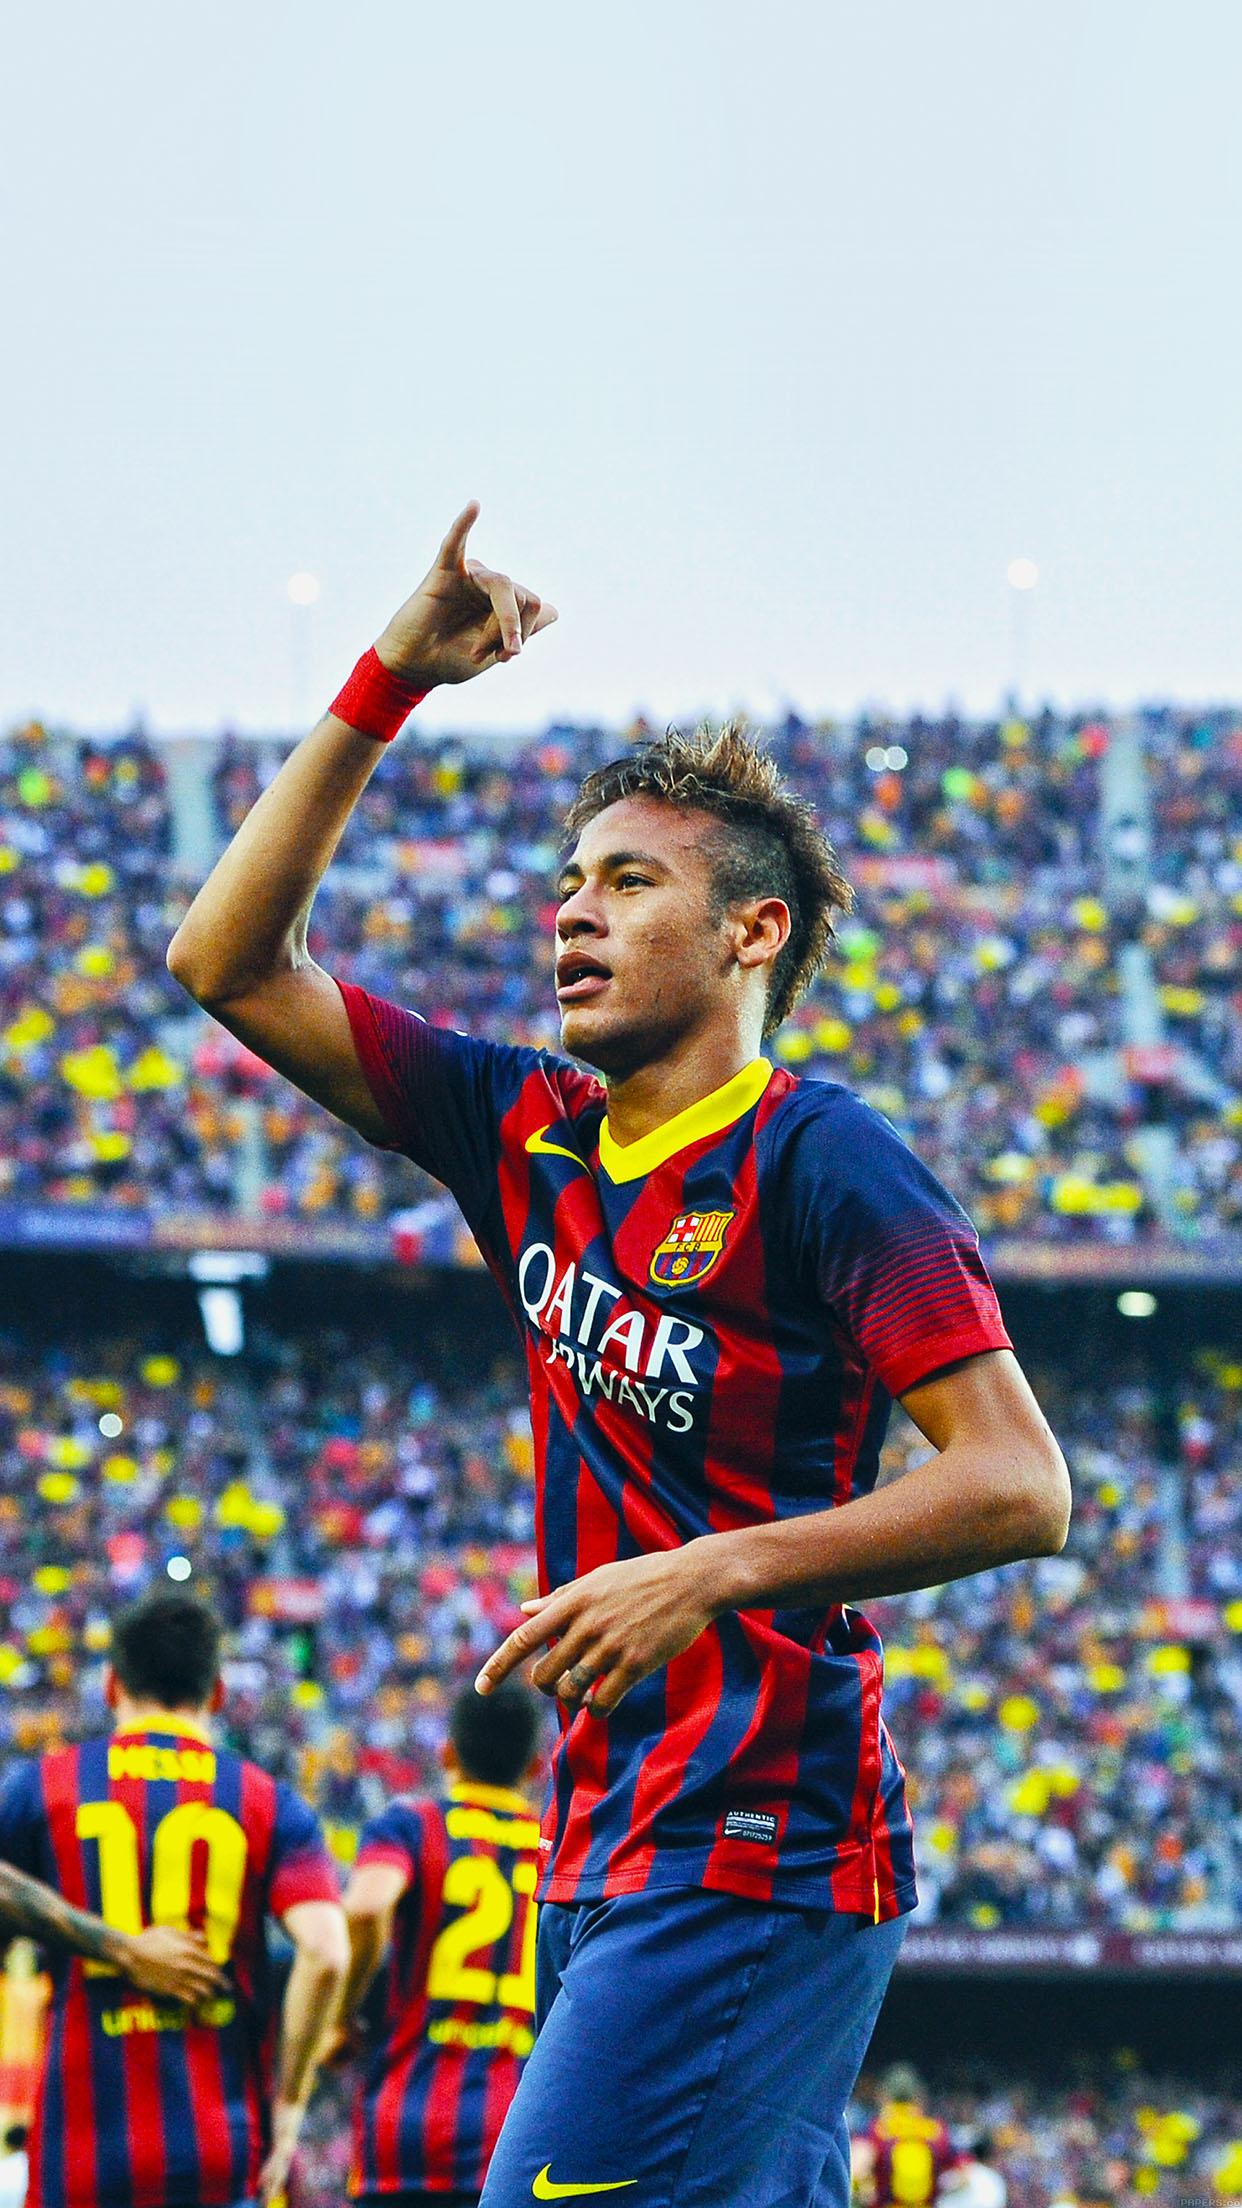 Wallpaper Nemar Barcelona Soccer Sports Face Android